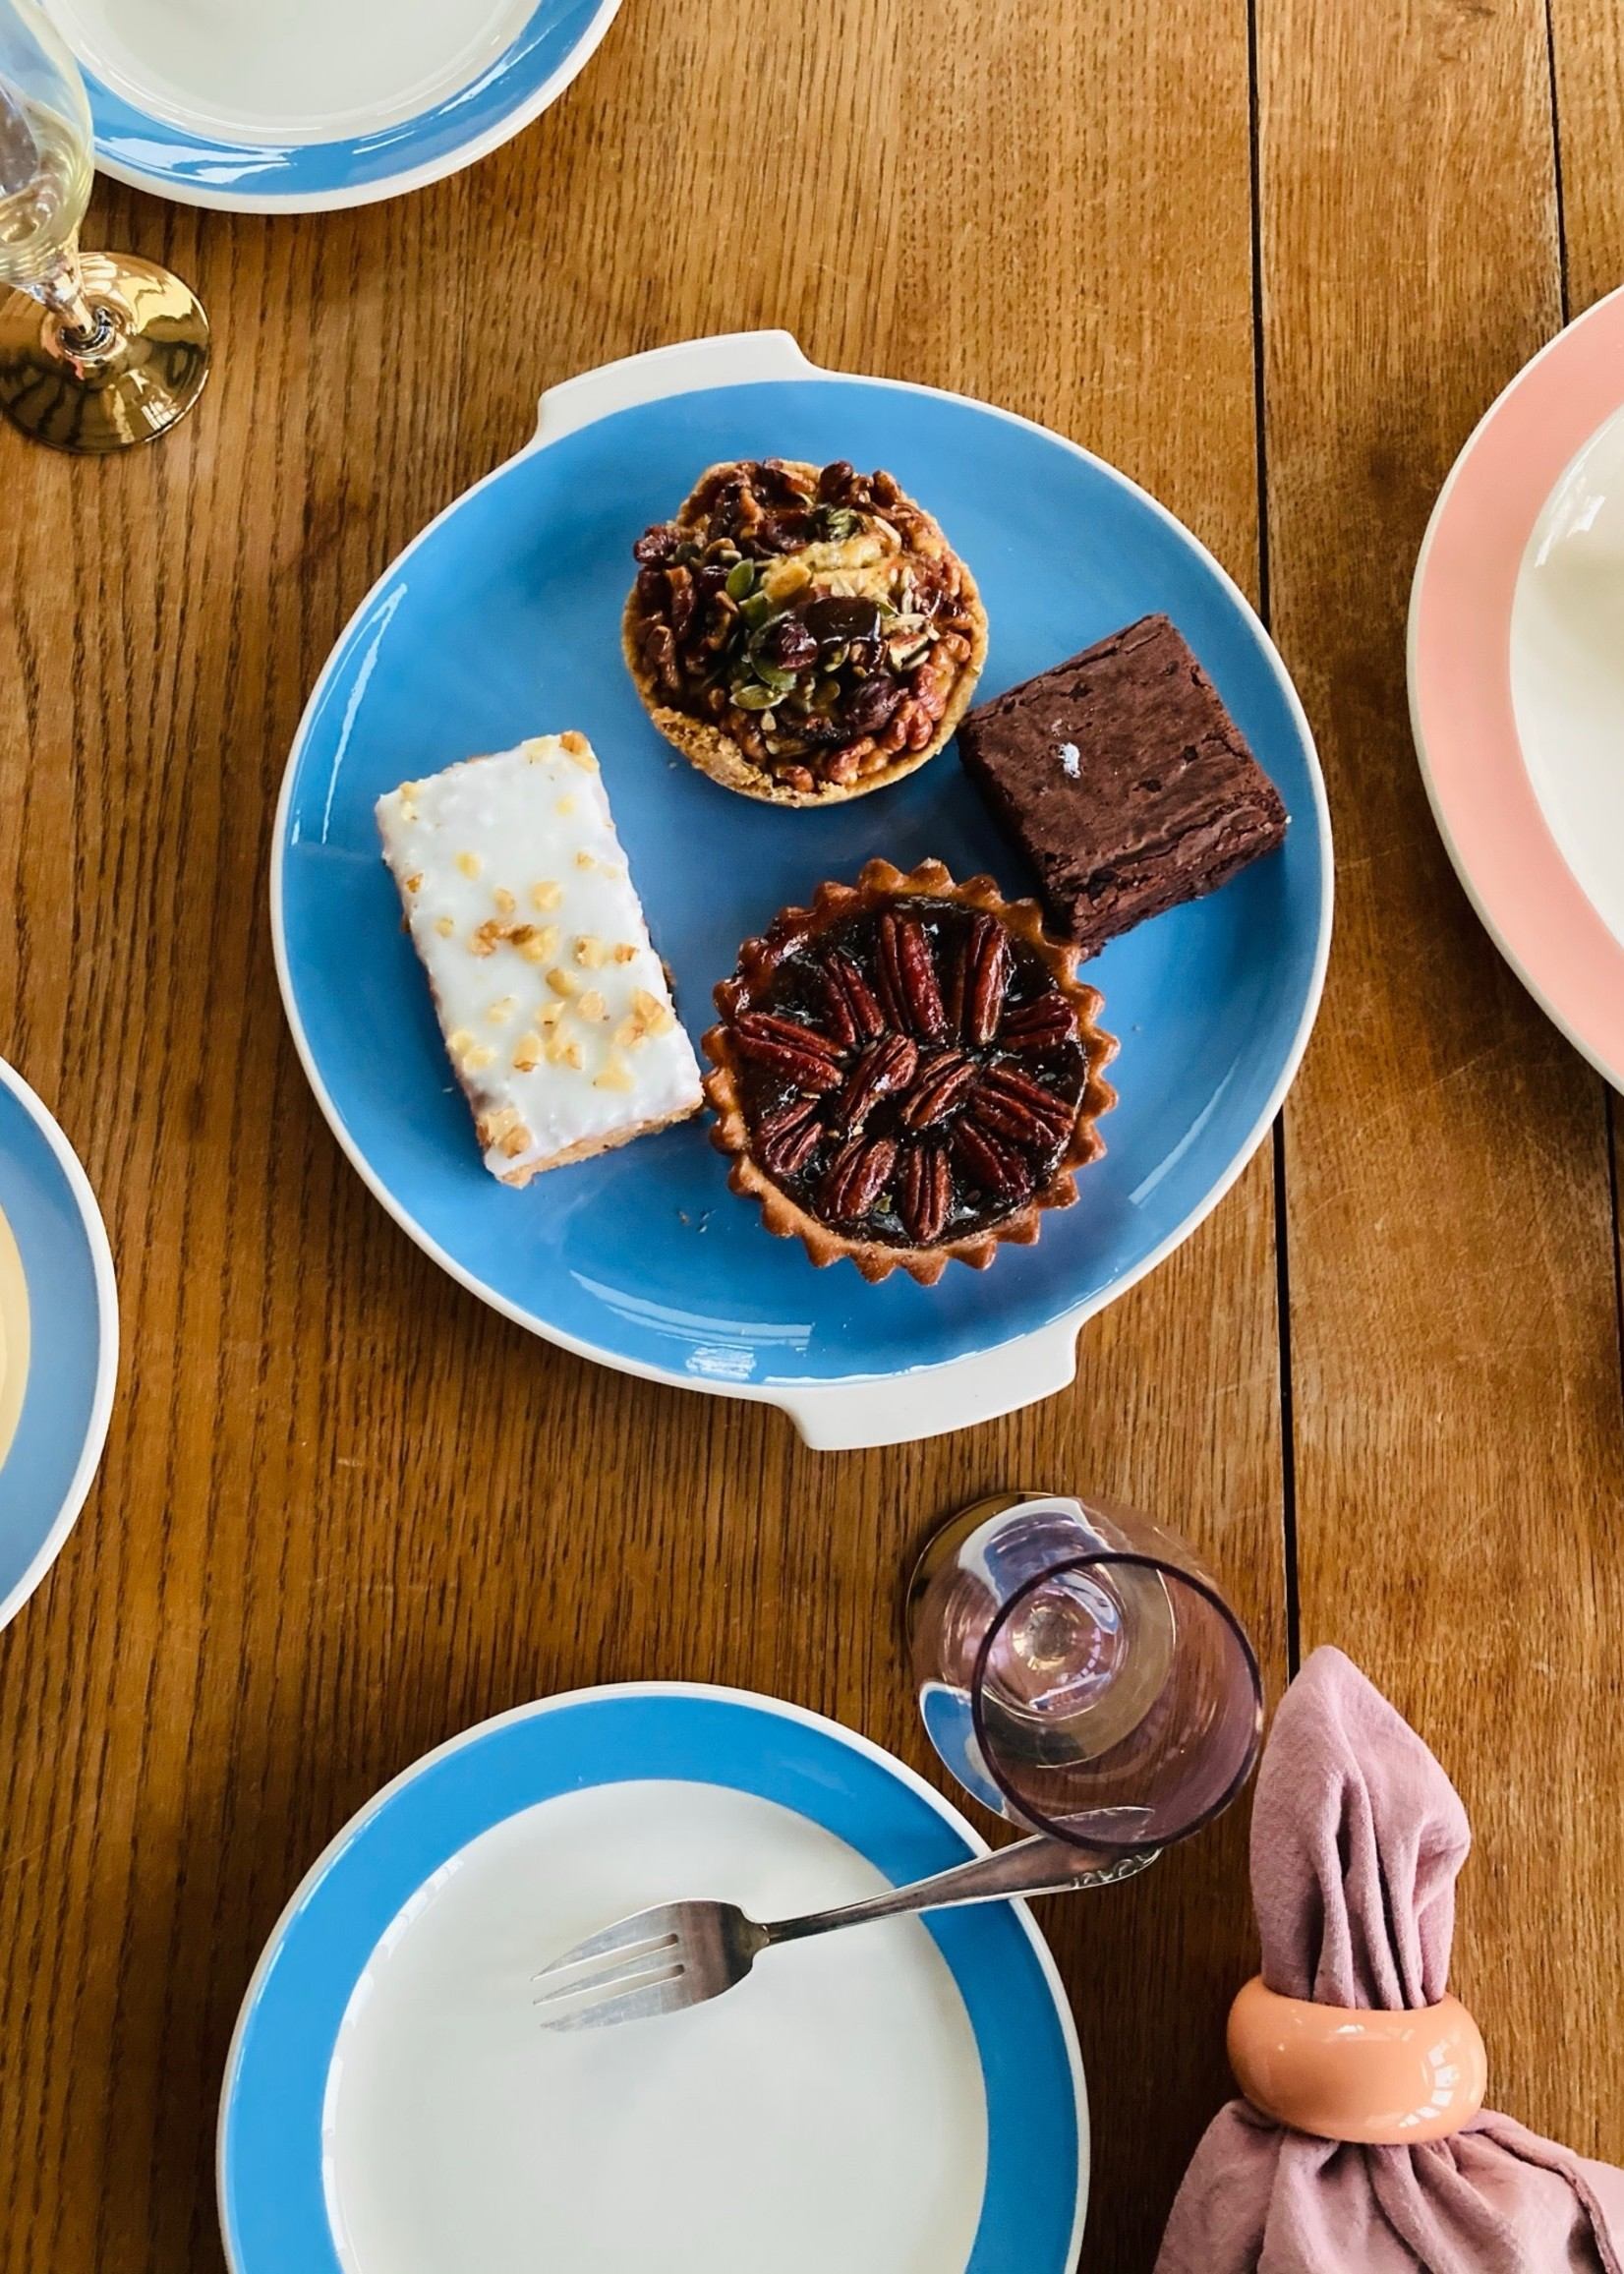 Dessert dish in Blue Orléans by Villeroy & Boch